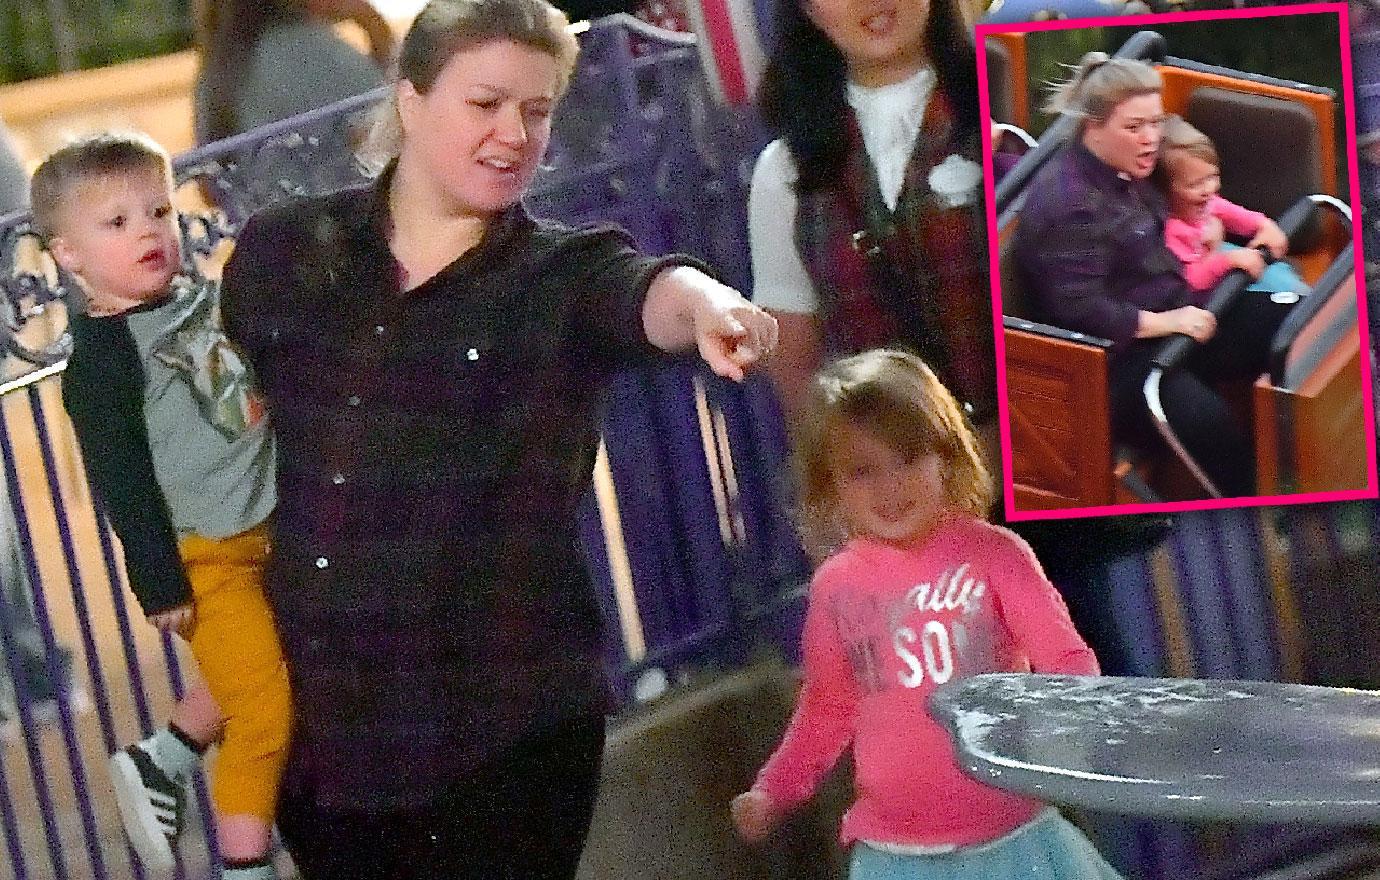 Kelly Clarkson Rides Dumbo Amid Talk Of Replacing Megyn Kelly